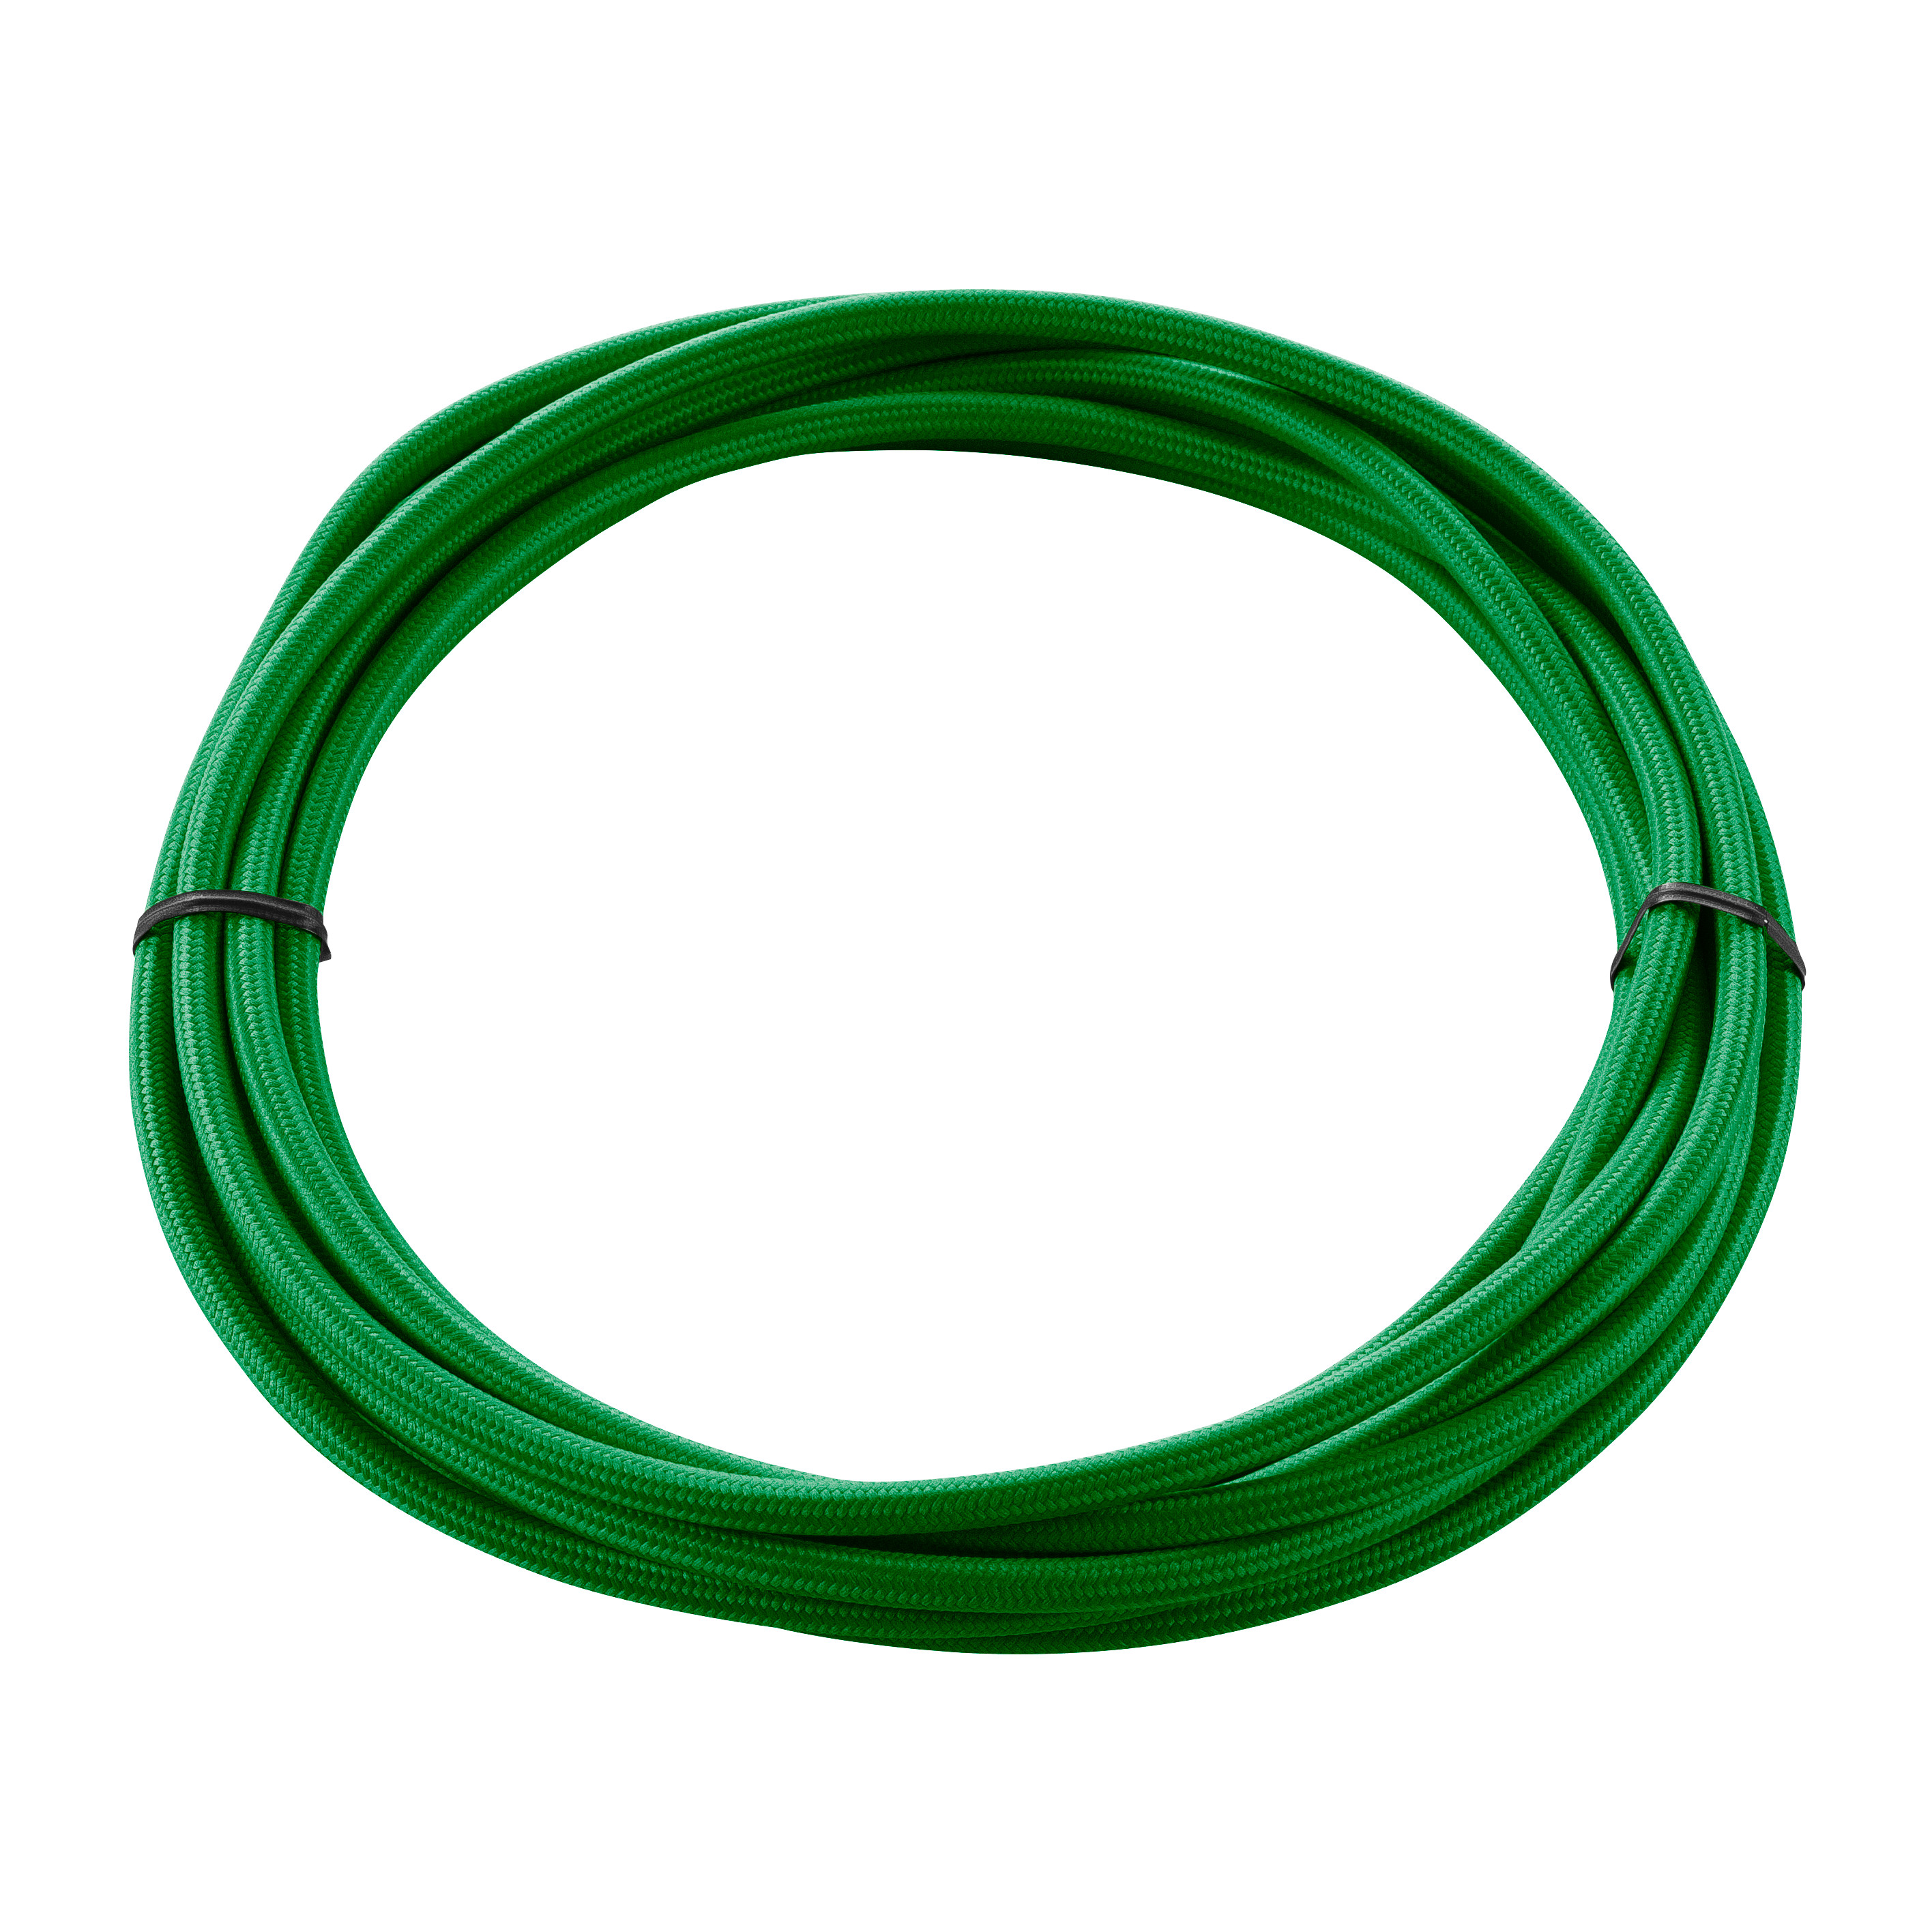 1 Stk TEXTILKABEL, 3-polig, 5 m, grün LI961375--